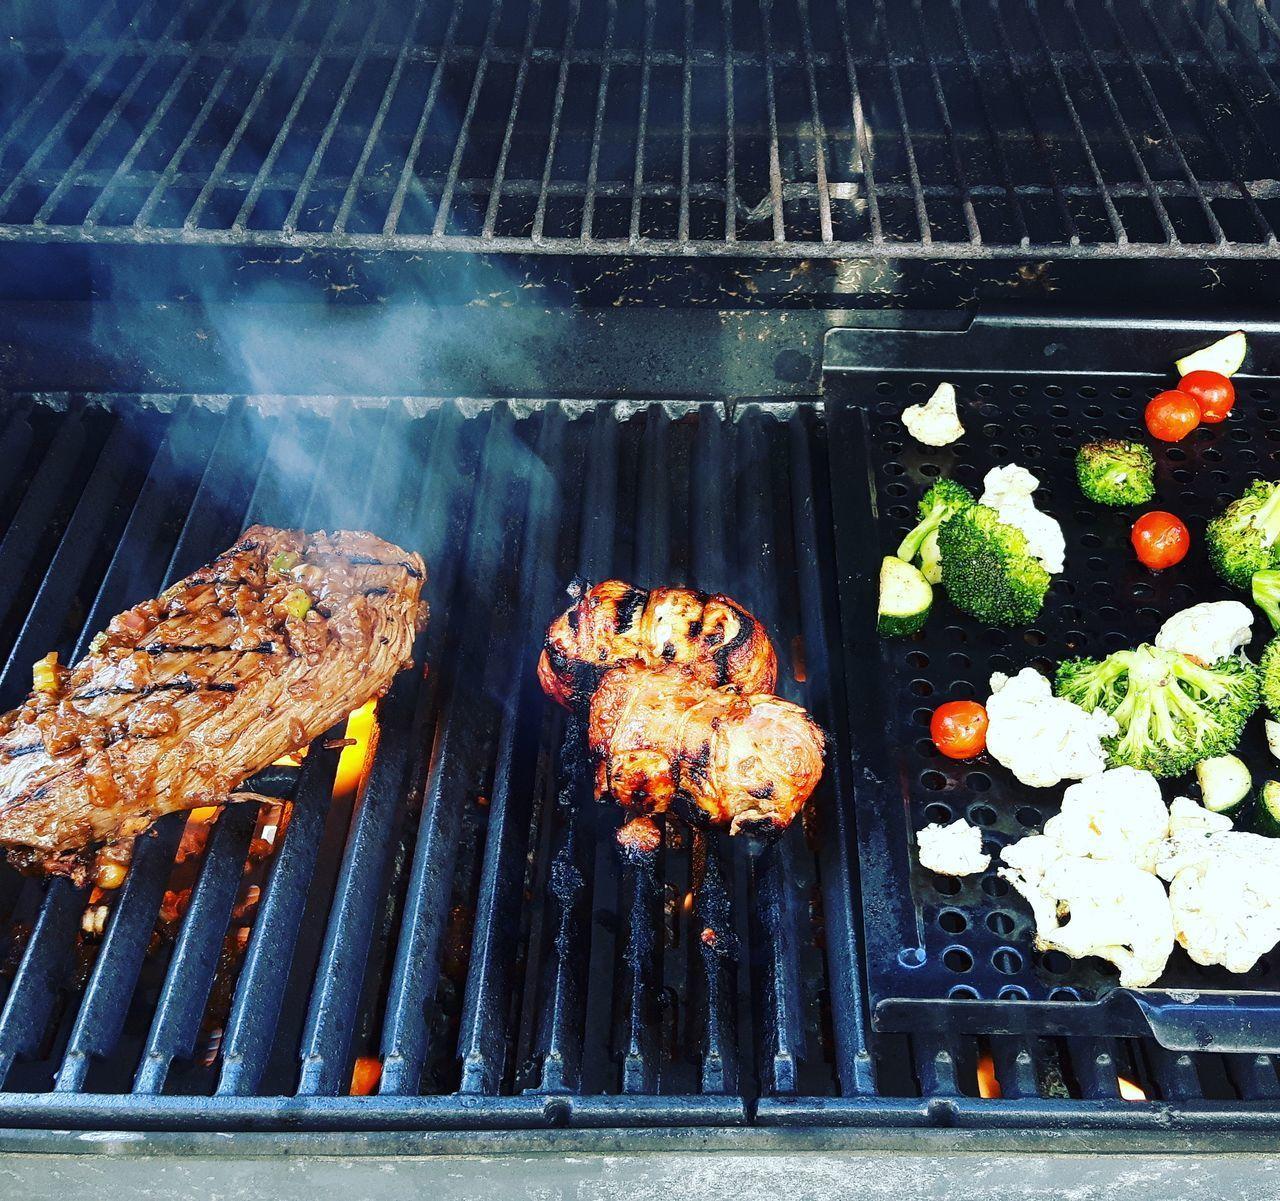 Outdoors Barbecue Food Freshness BBQ BBQ Time Bavette Legume Vegetables